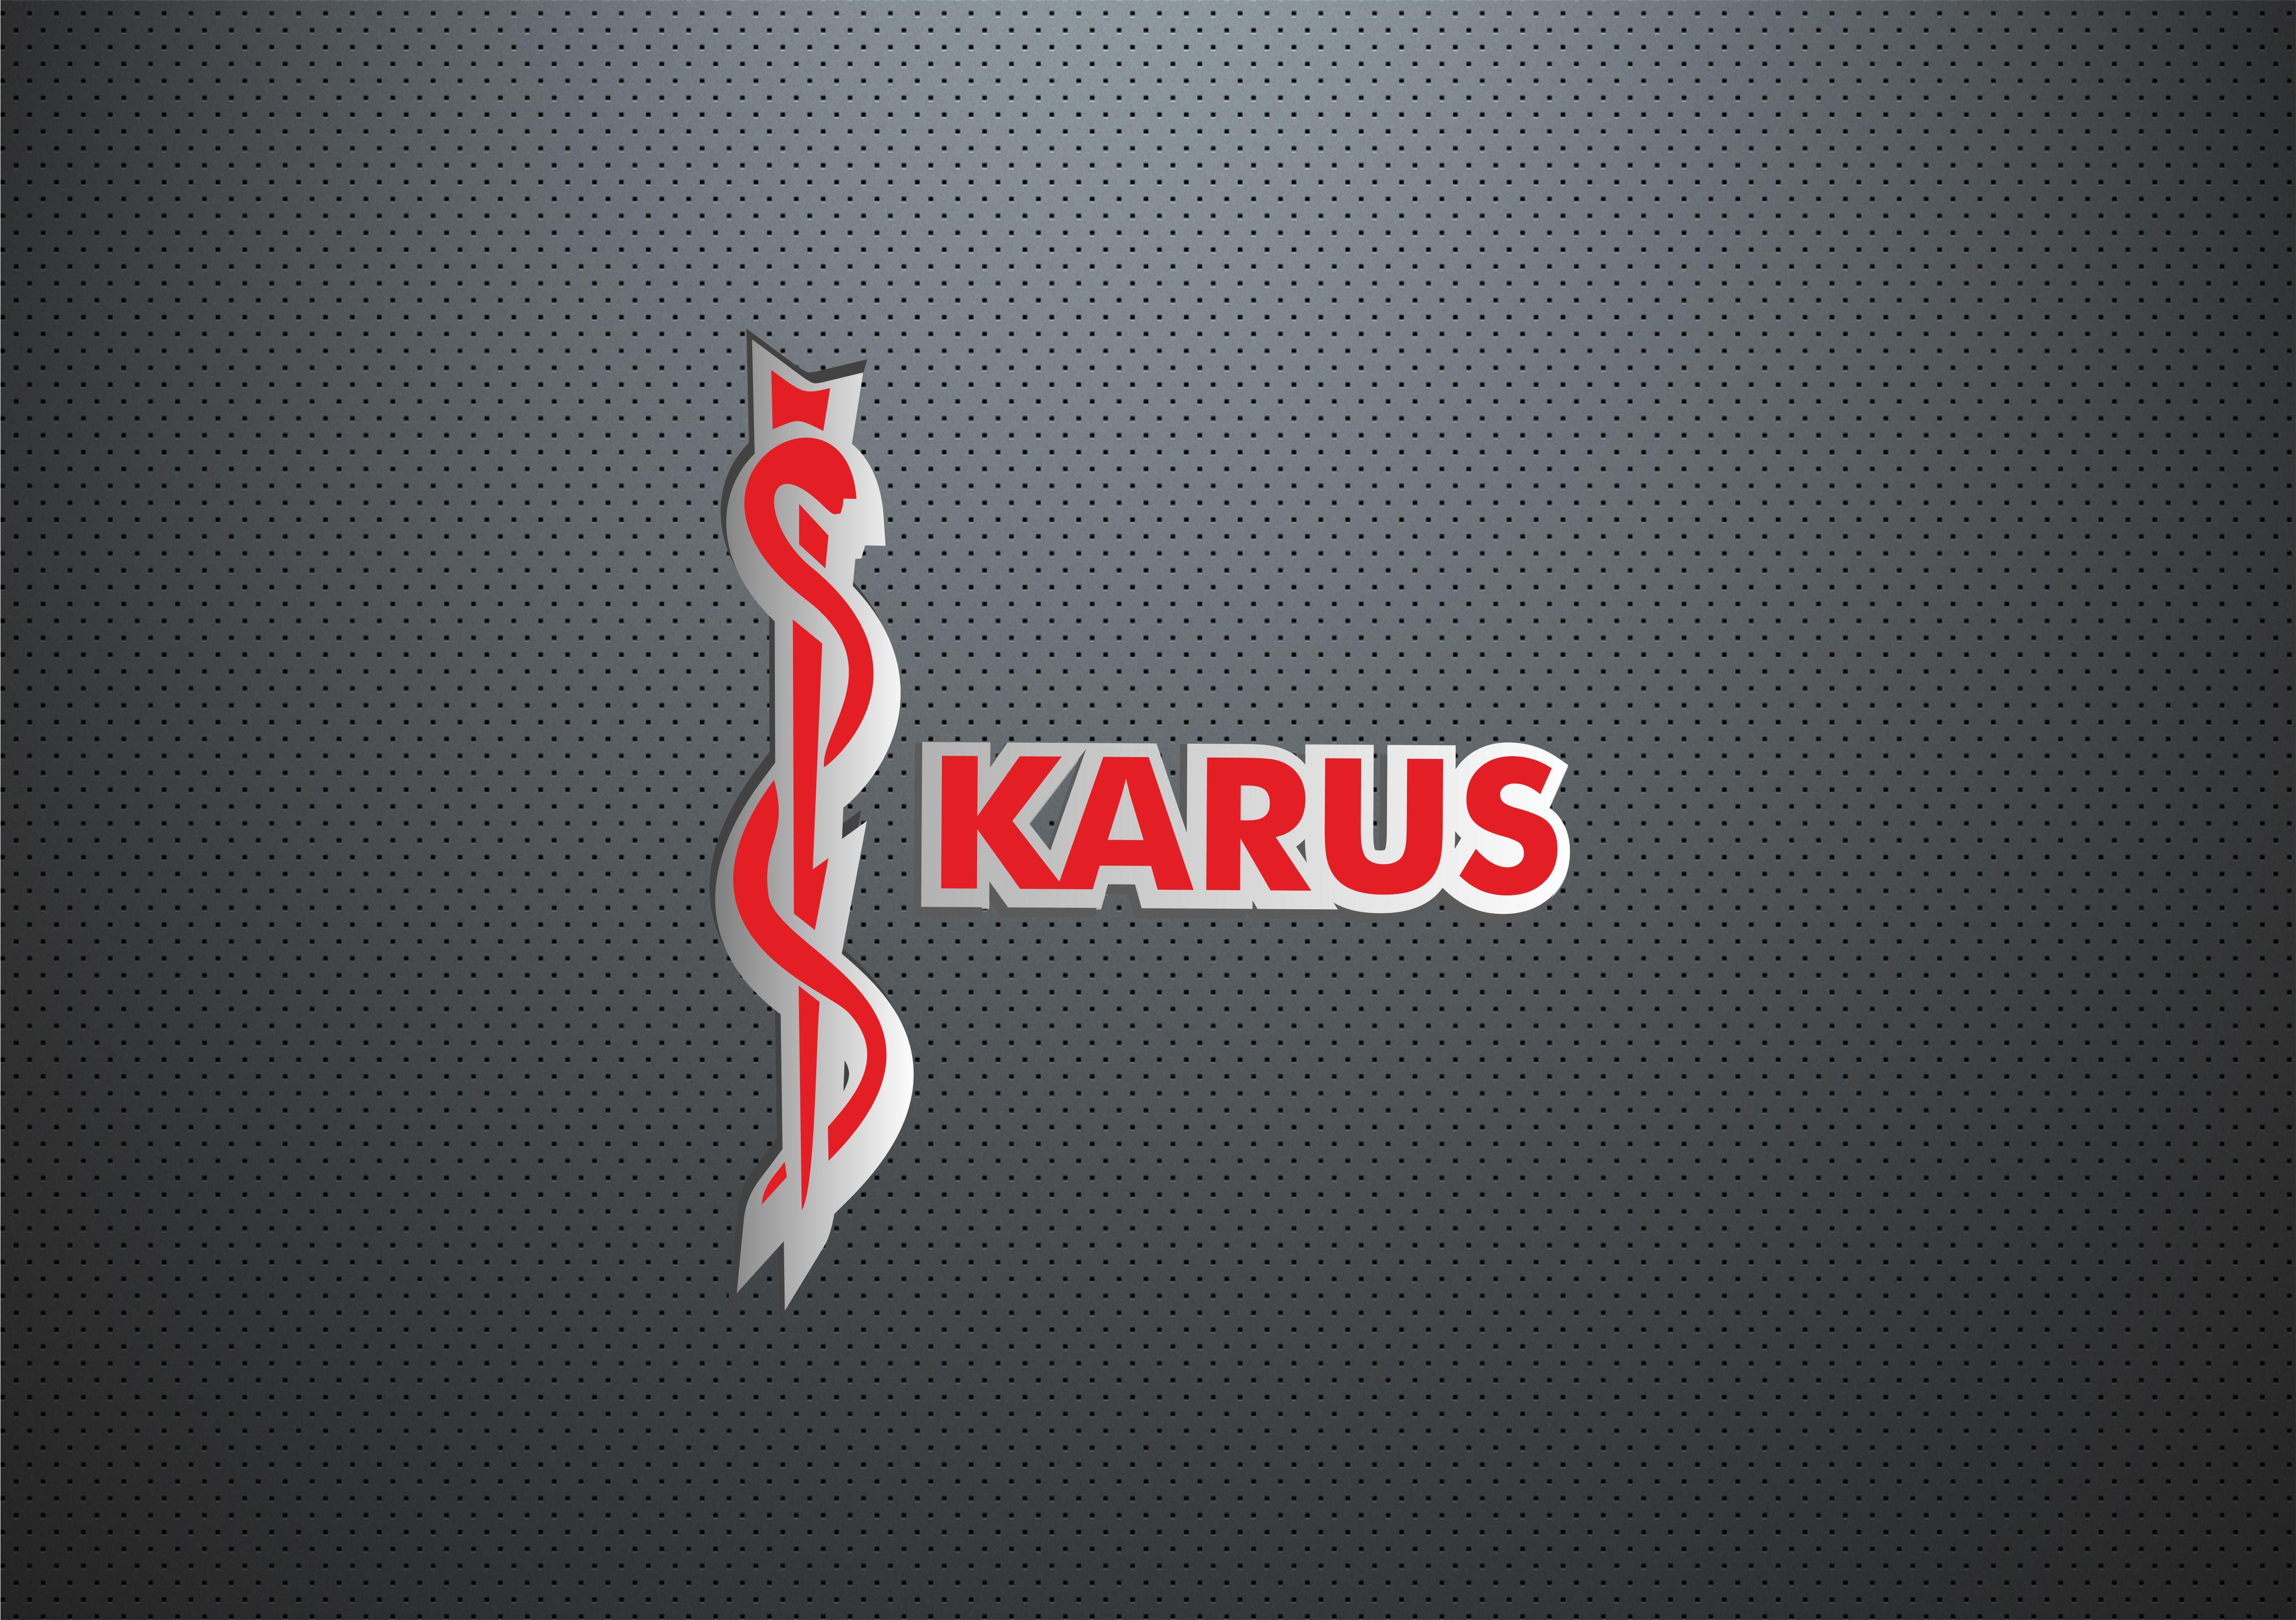 Разработка логотипа, фирменных цветов и фирменного знака фото f_2265353f58b51484.jpg